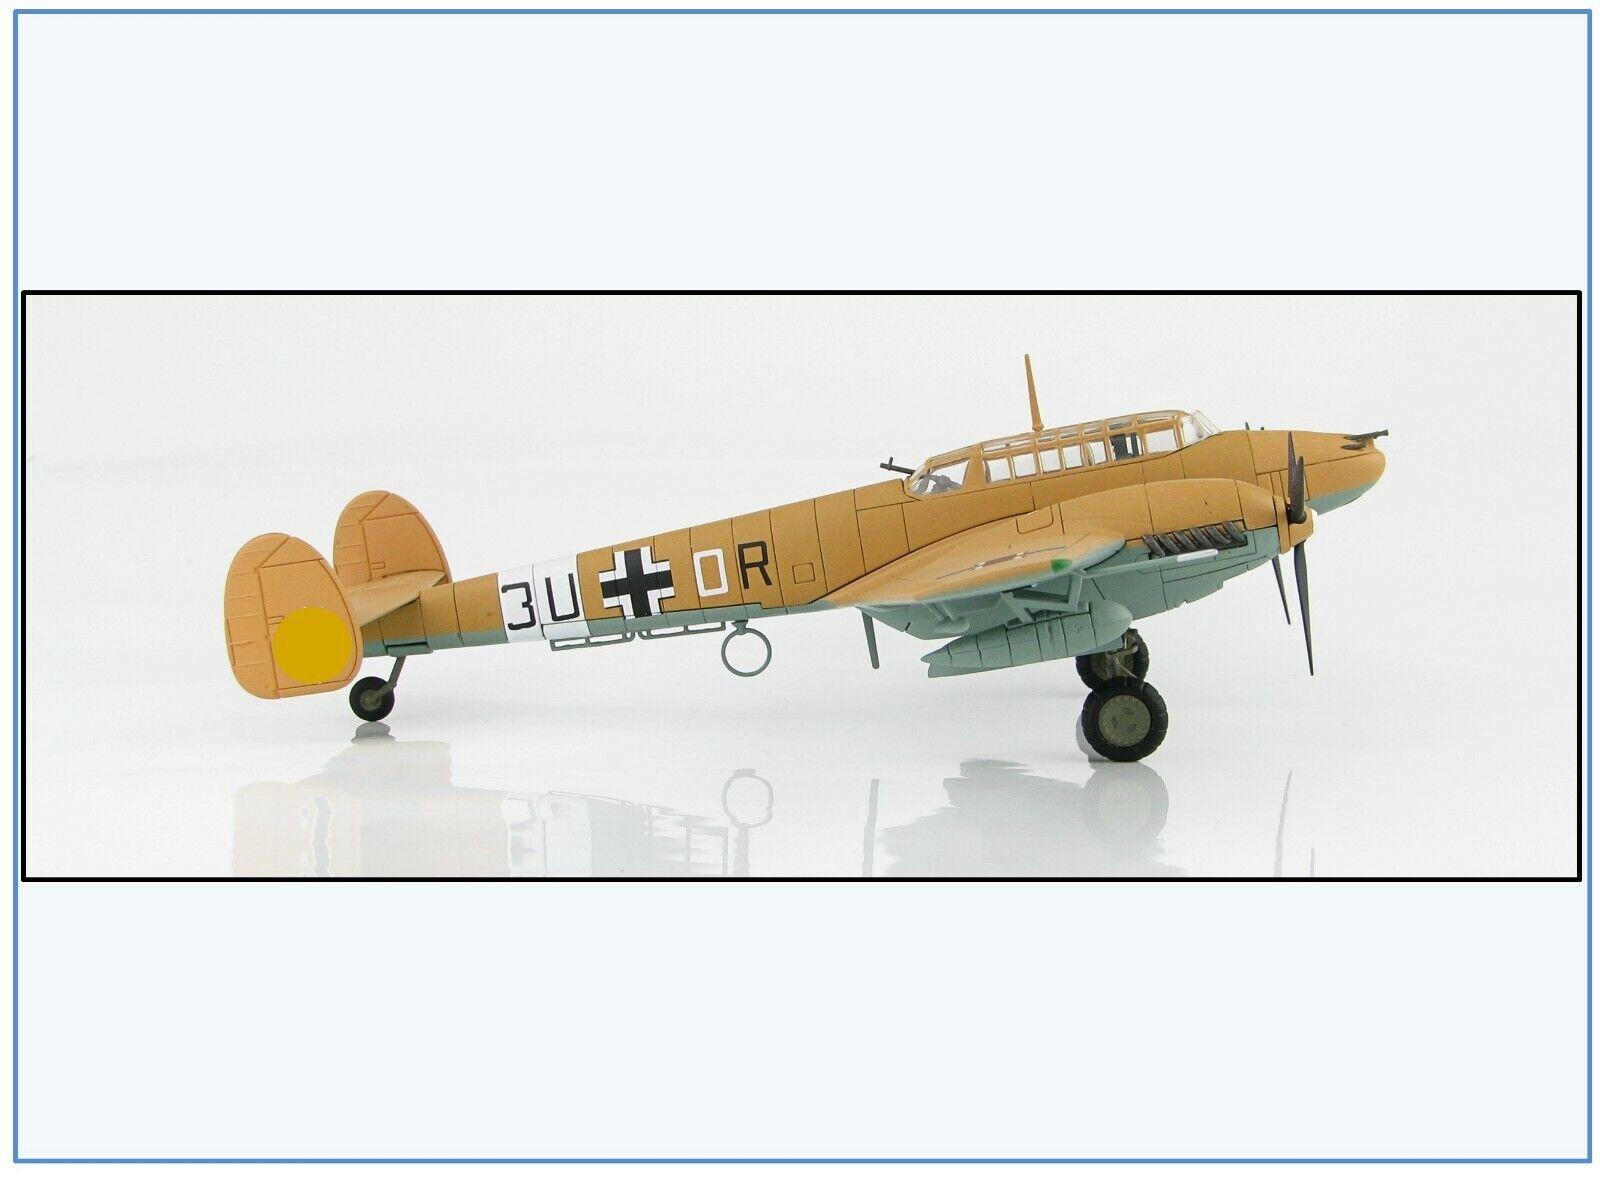 HA1815 Messerschmitt Bf-110E-2 Bf-110E-2 Bf-110E-2 trop 7. ZG 26, Libyen 1942,Hobbymaster 1 72 NEU &  | New Style  0ba865